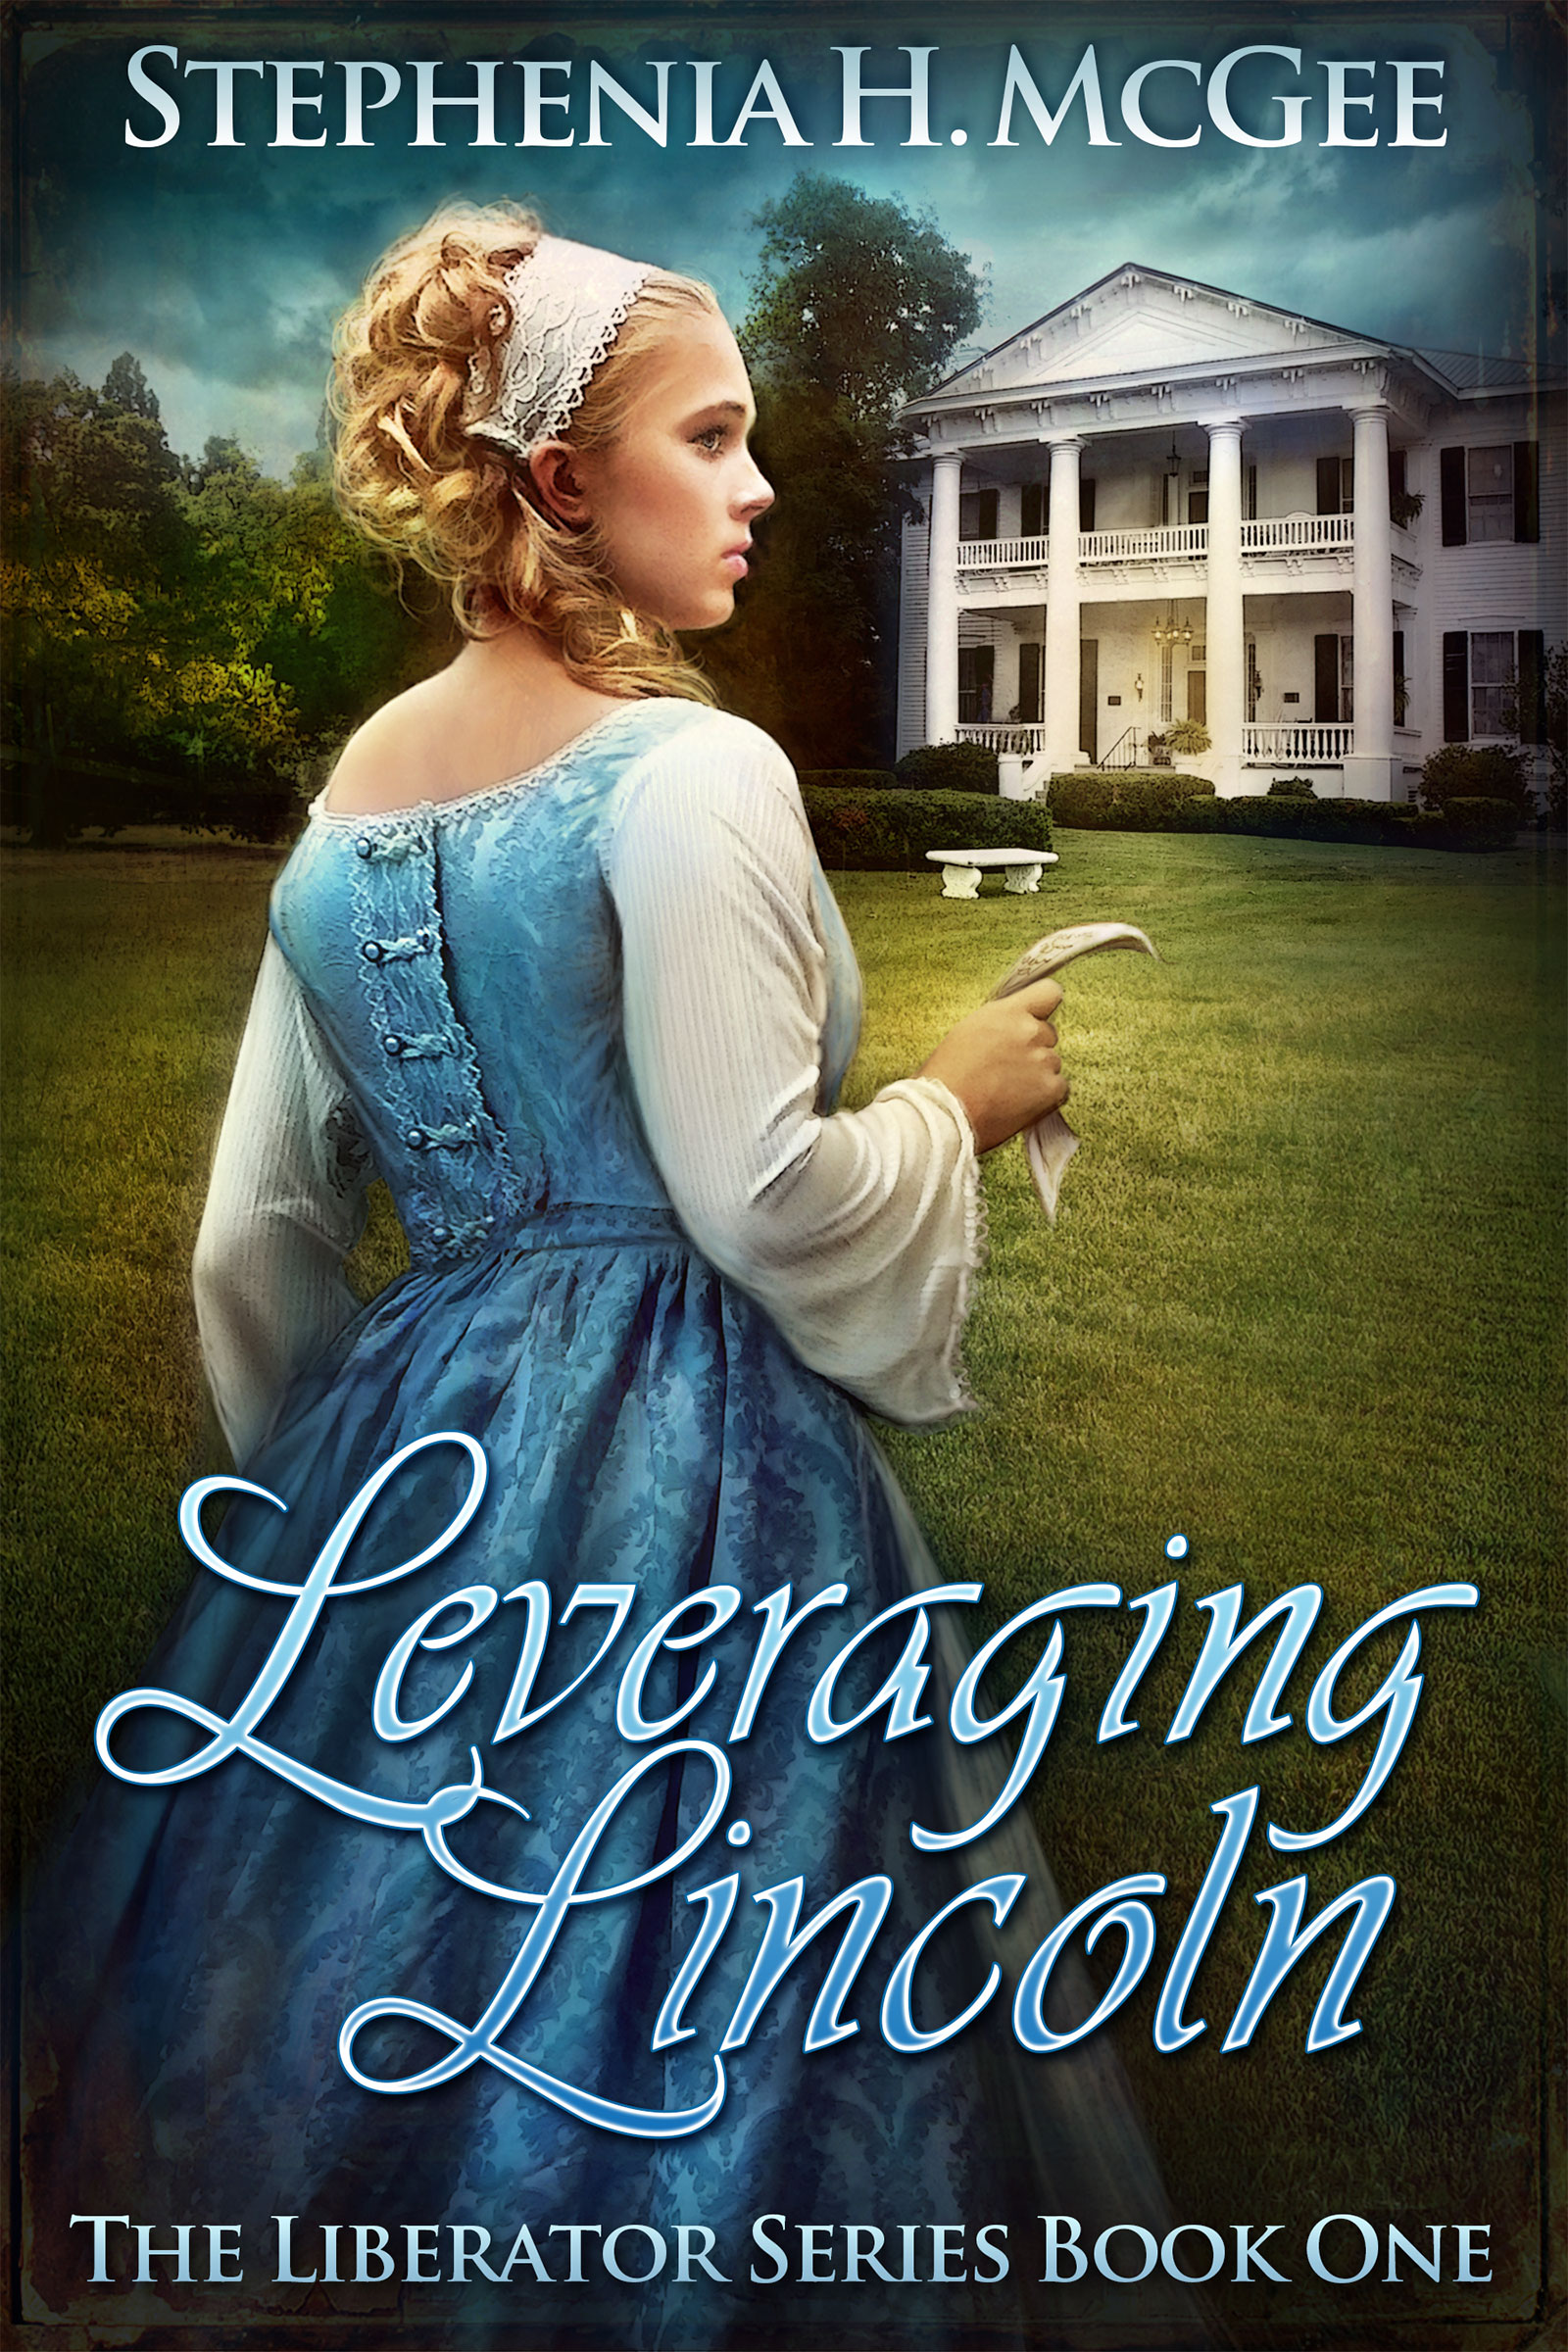 Leveraging Lincoln - Stephenia H. McGee